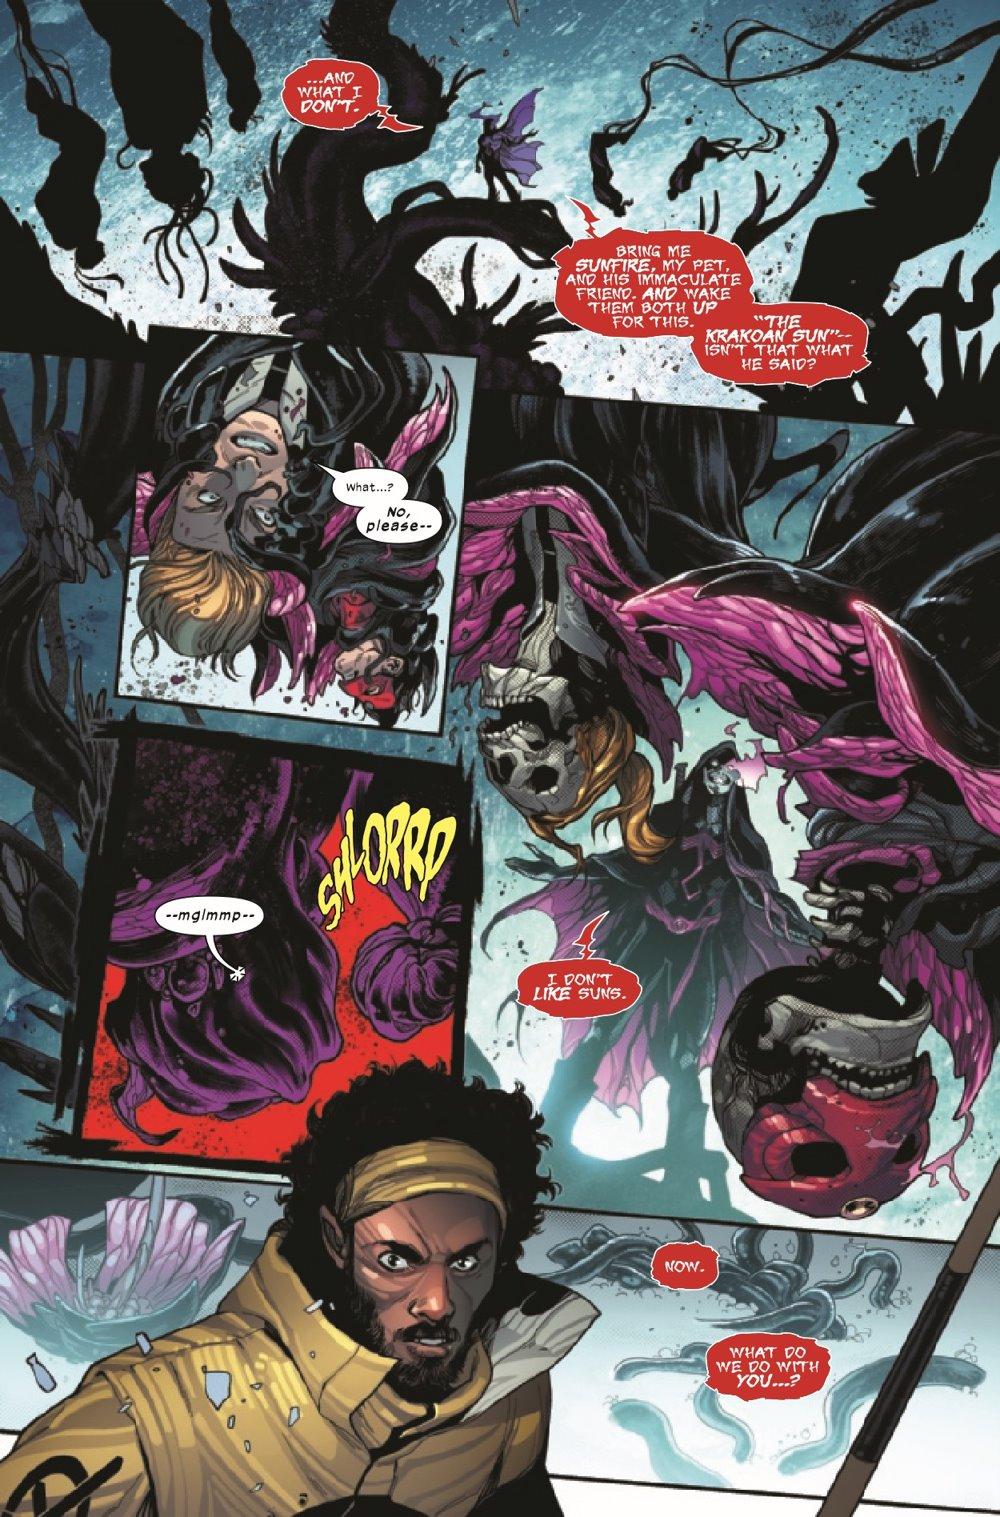 SWORD2020004_Preview-3 ComicList Previews: S.W.O.R.D. #4